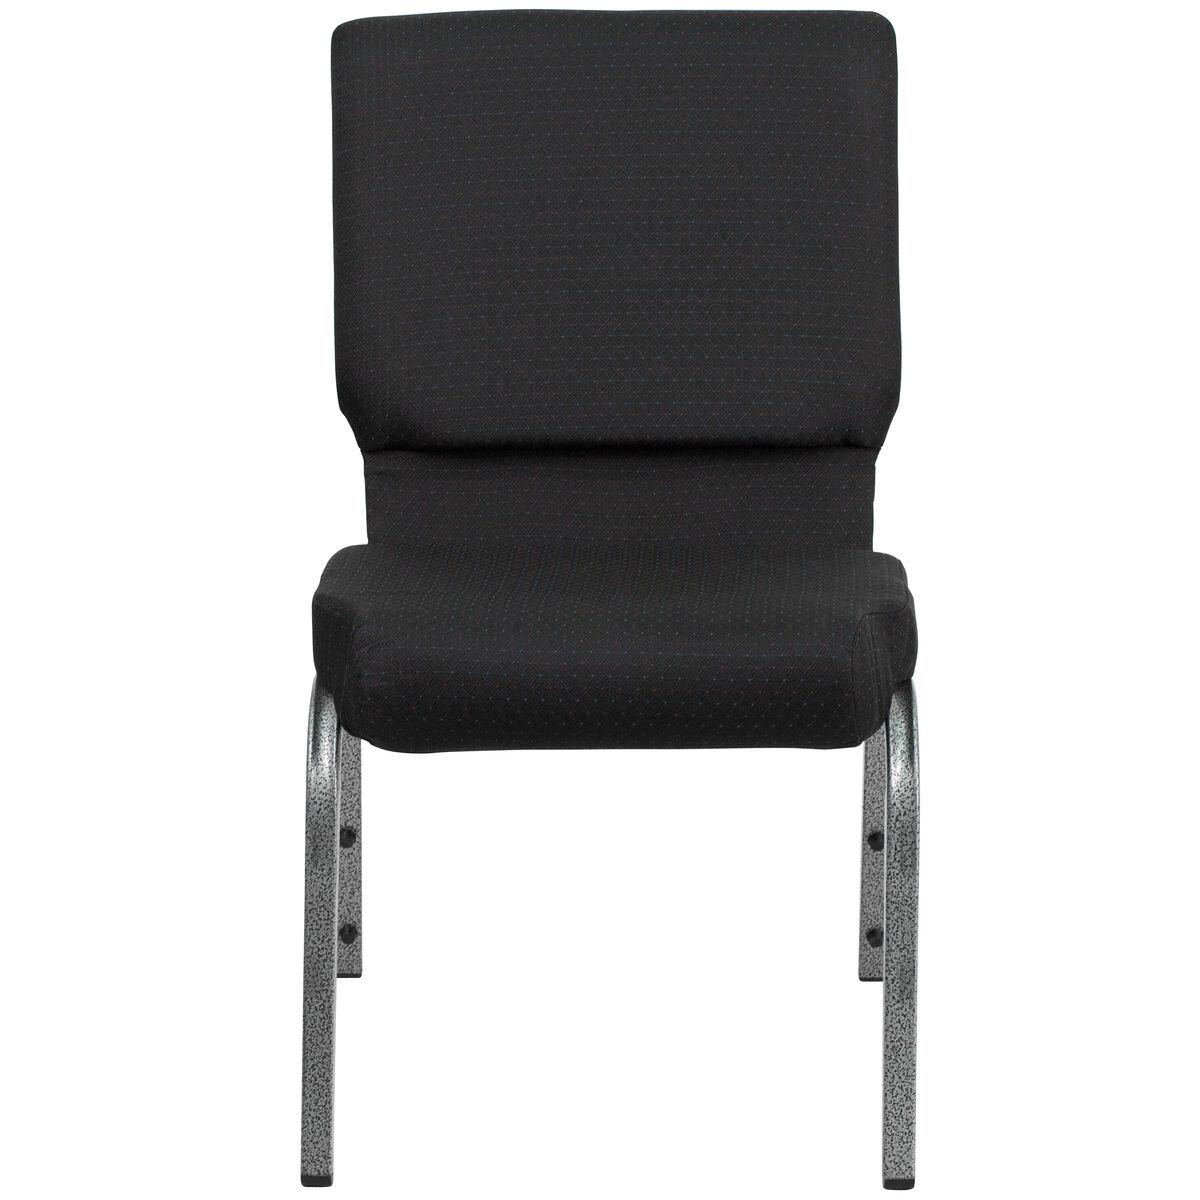 Black Fabric Church Chair Fd Ch02185 Sv Jp02 Gg